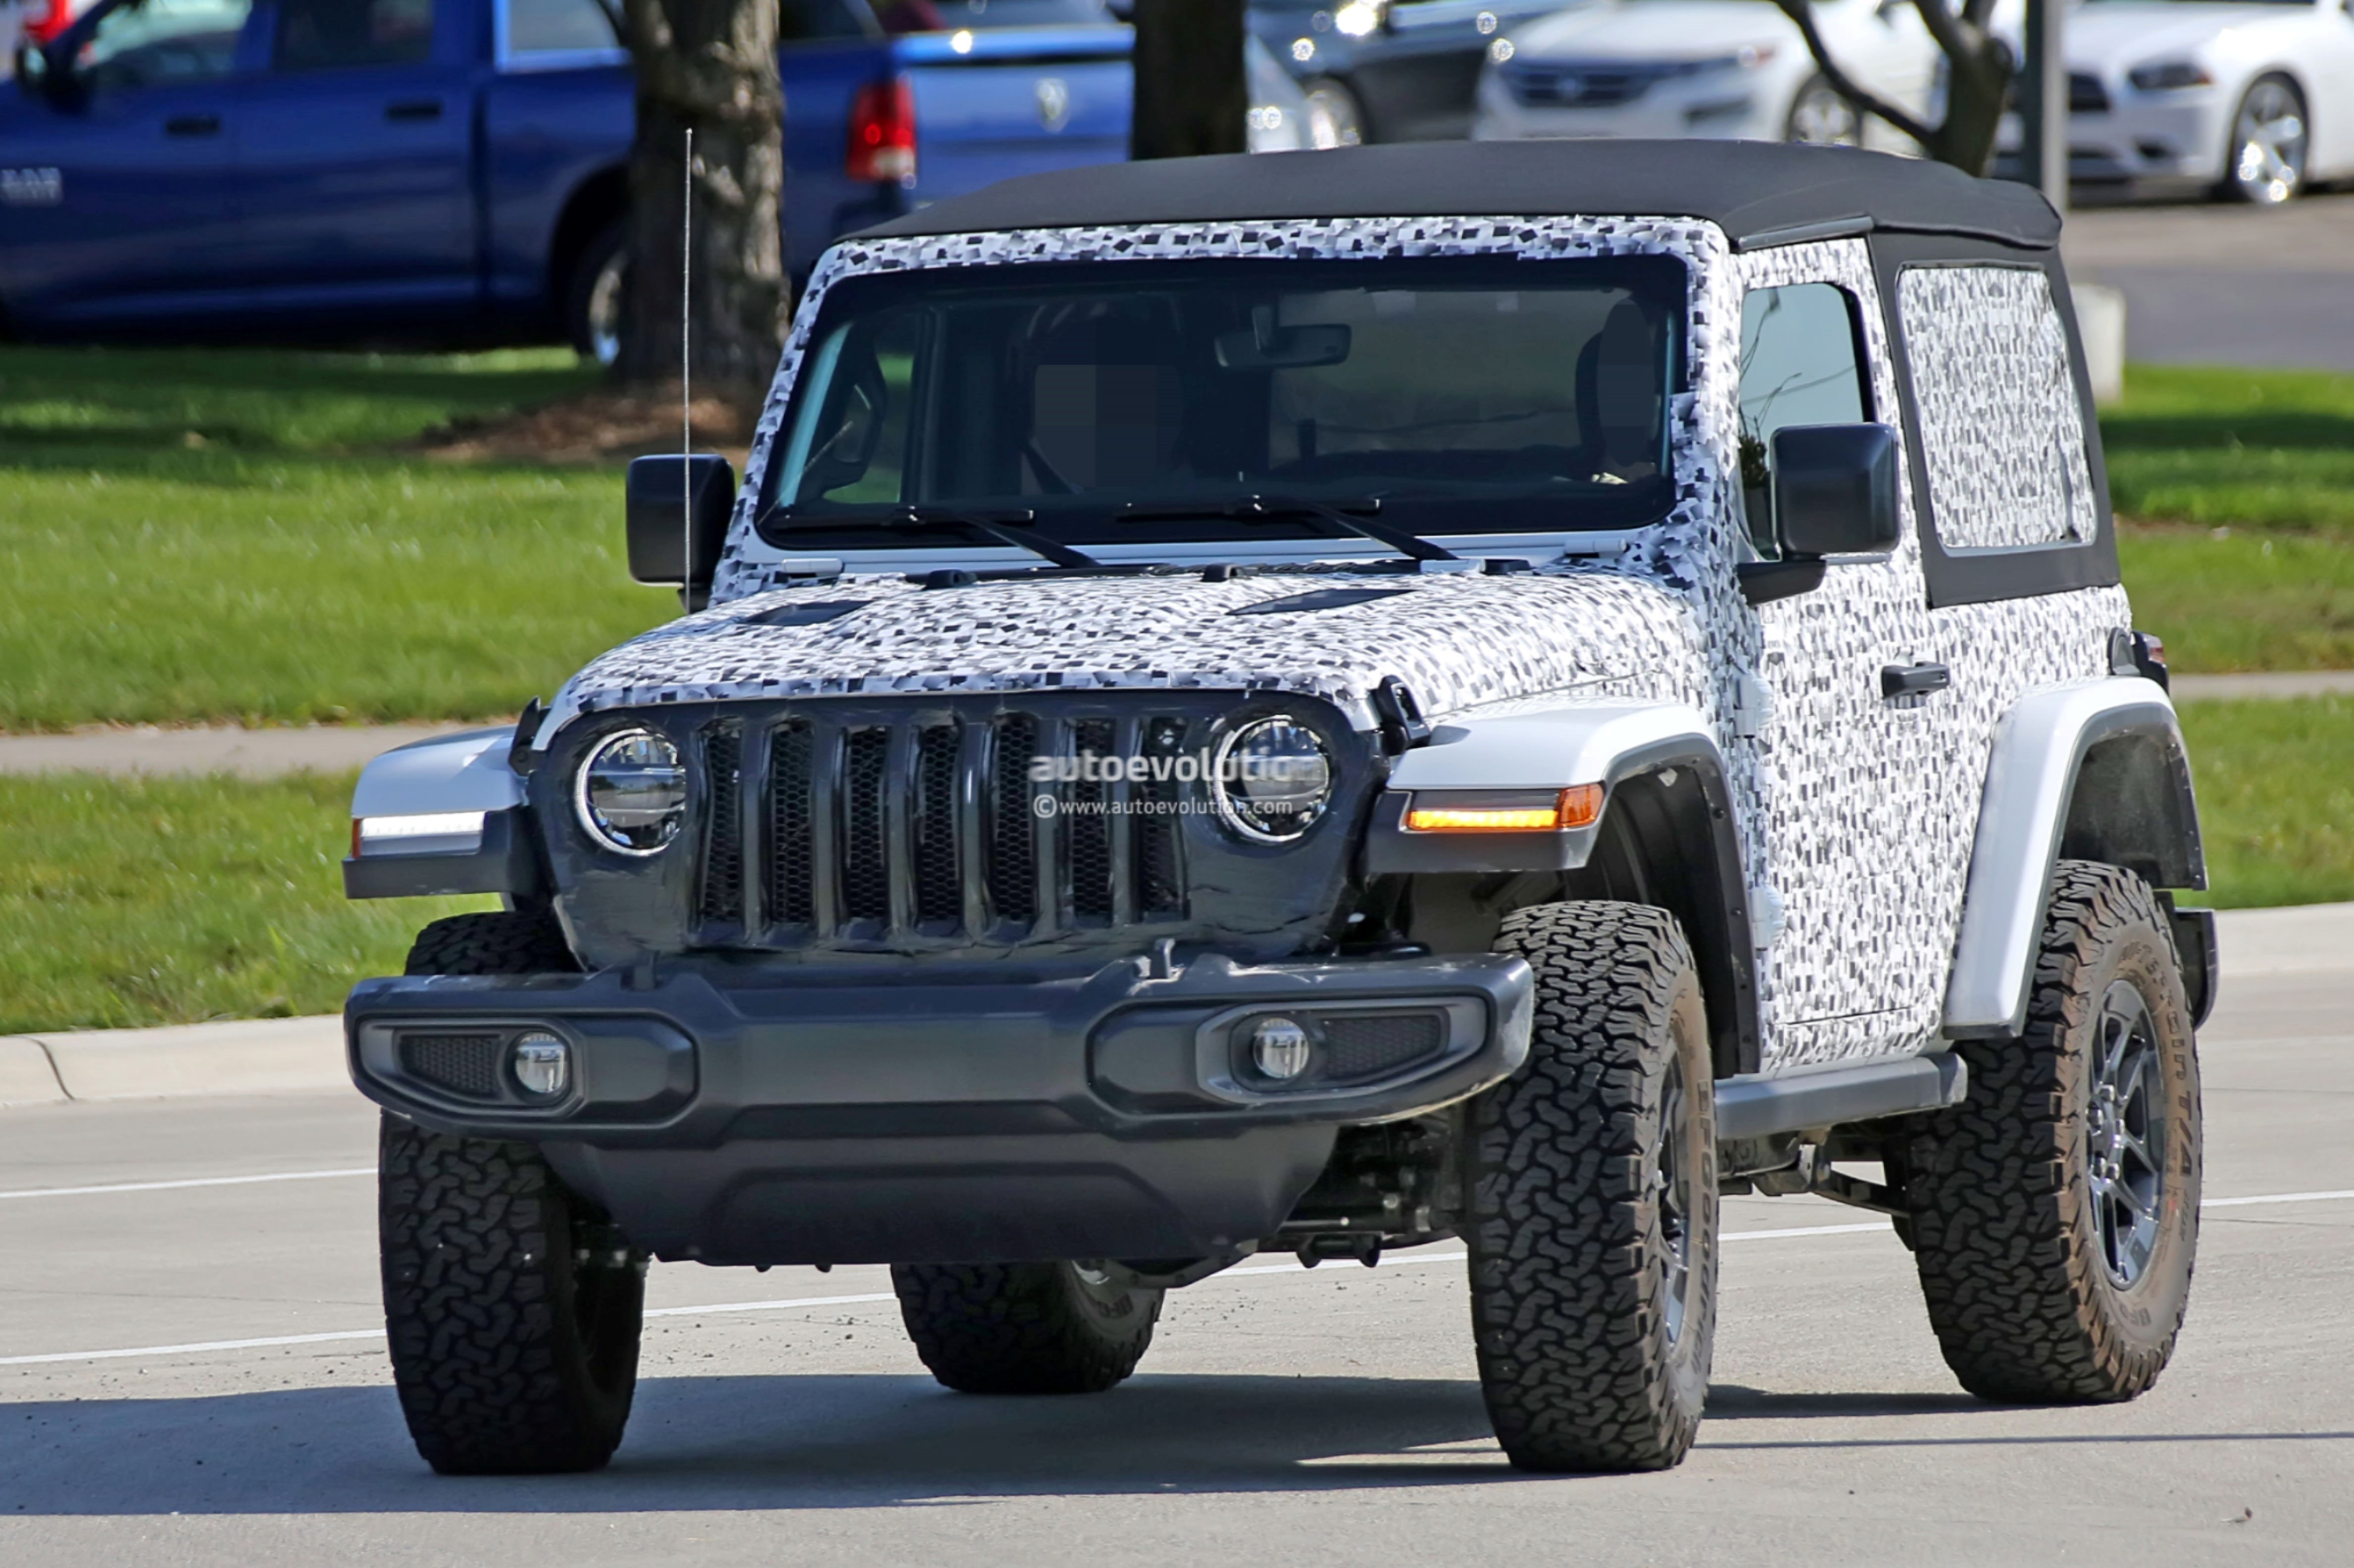 2018 jeep wrangler unlimited.  wrangler 2018 jeep wrangler jl prototype on jeep wrangler unlimited